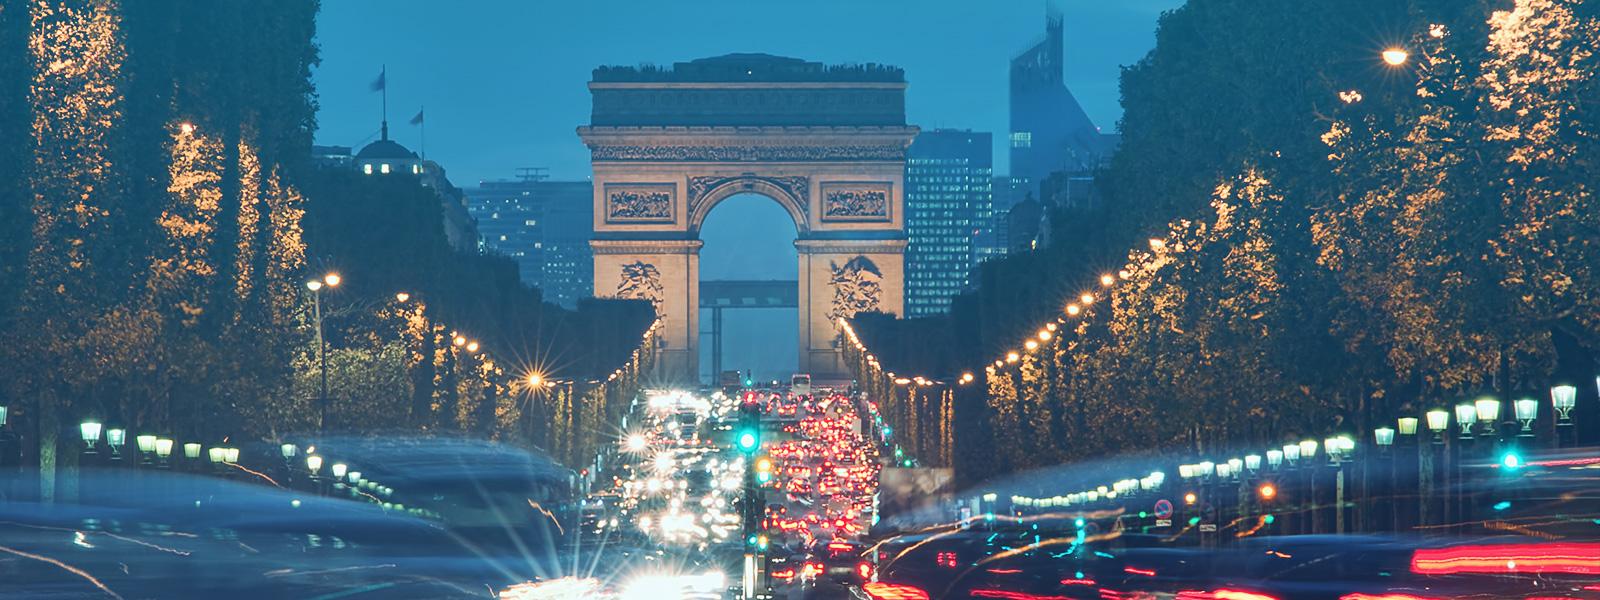 franca-vai-banir-veiculos-antigos-ruas-parisienses-blog-ceabs